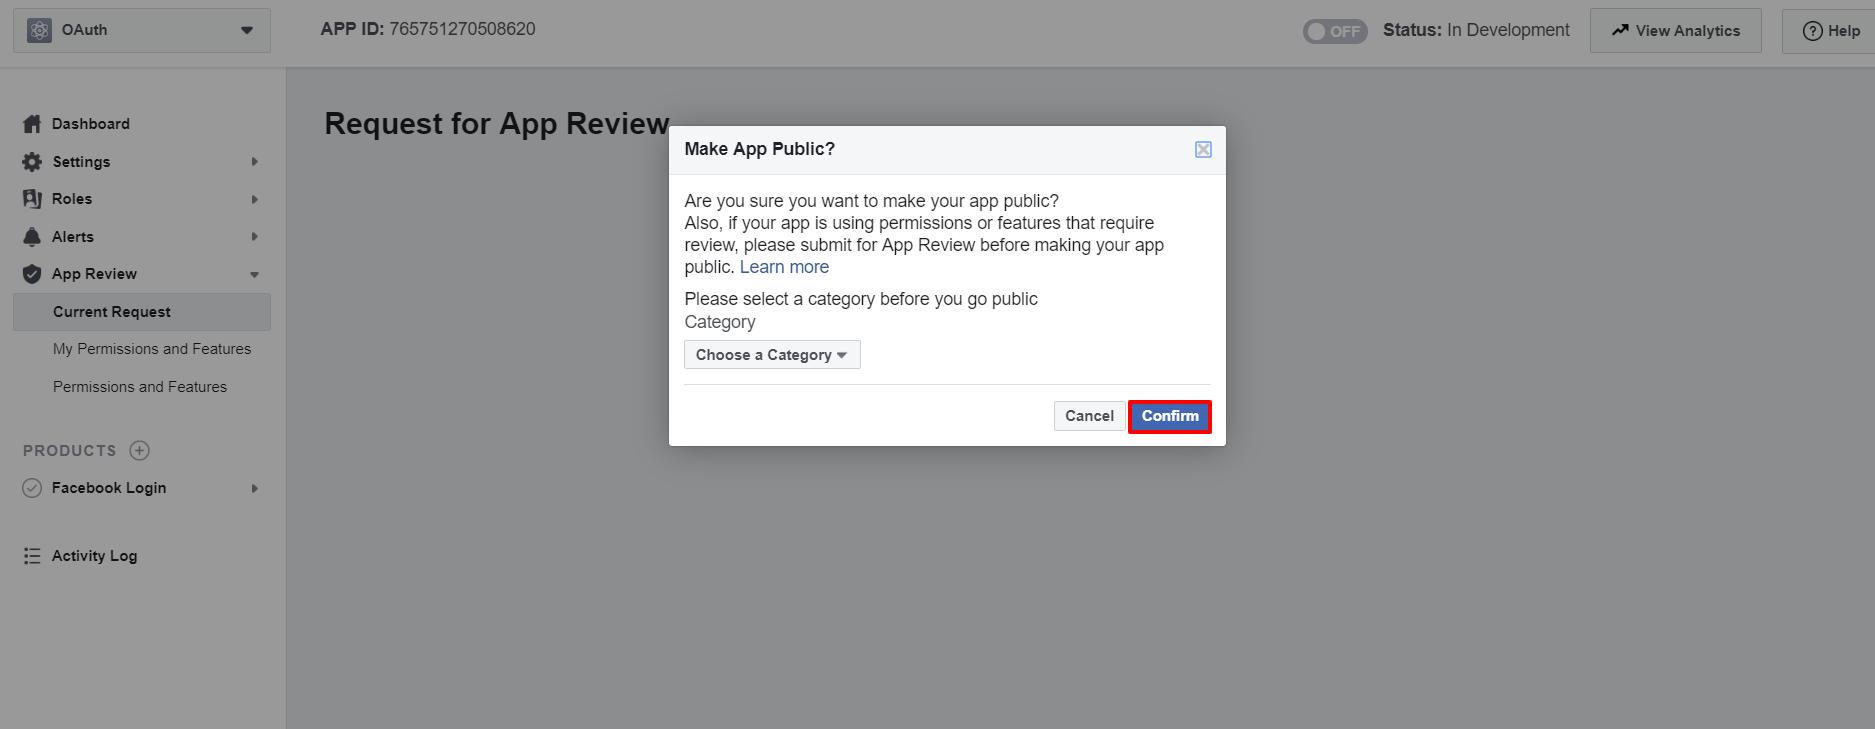 OAuth/OpenID/OIDC Single Sign On (SSO), Facebook SSO Login Make app public